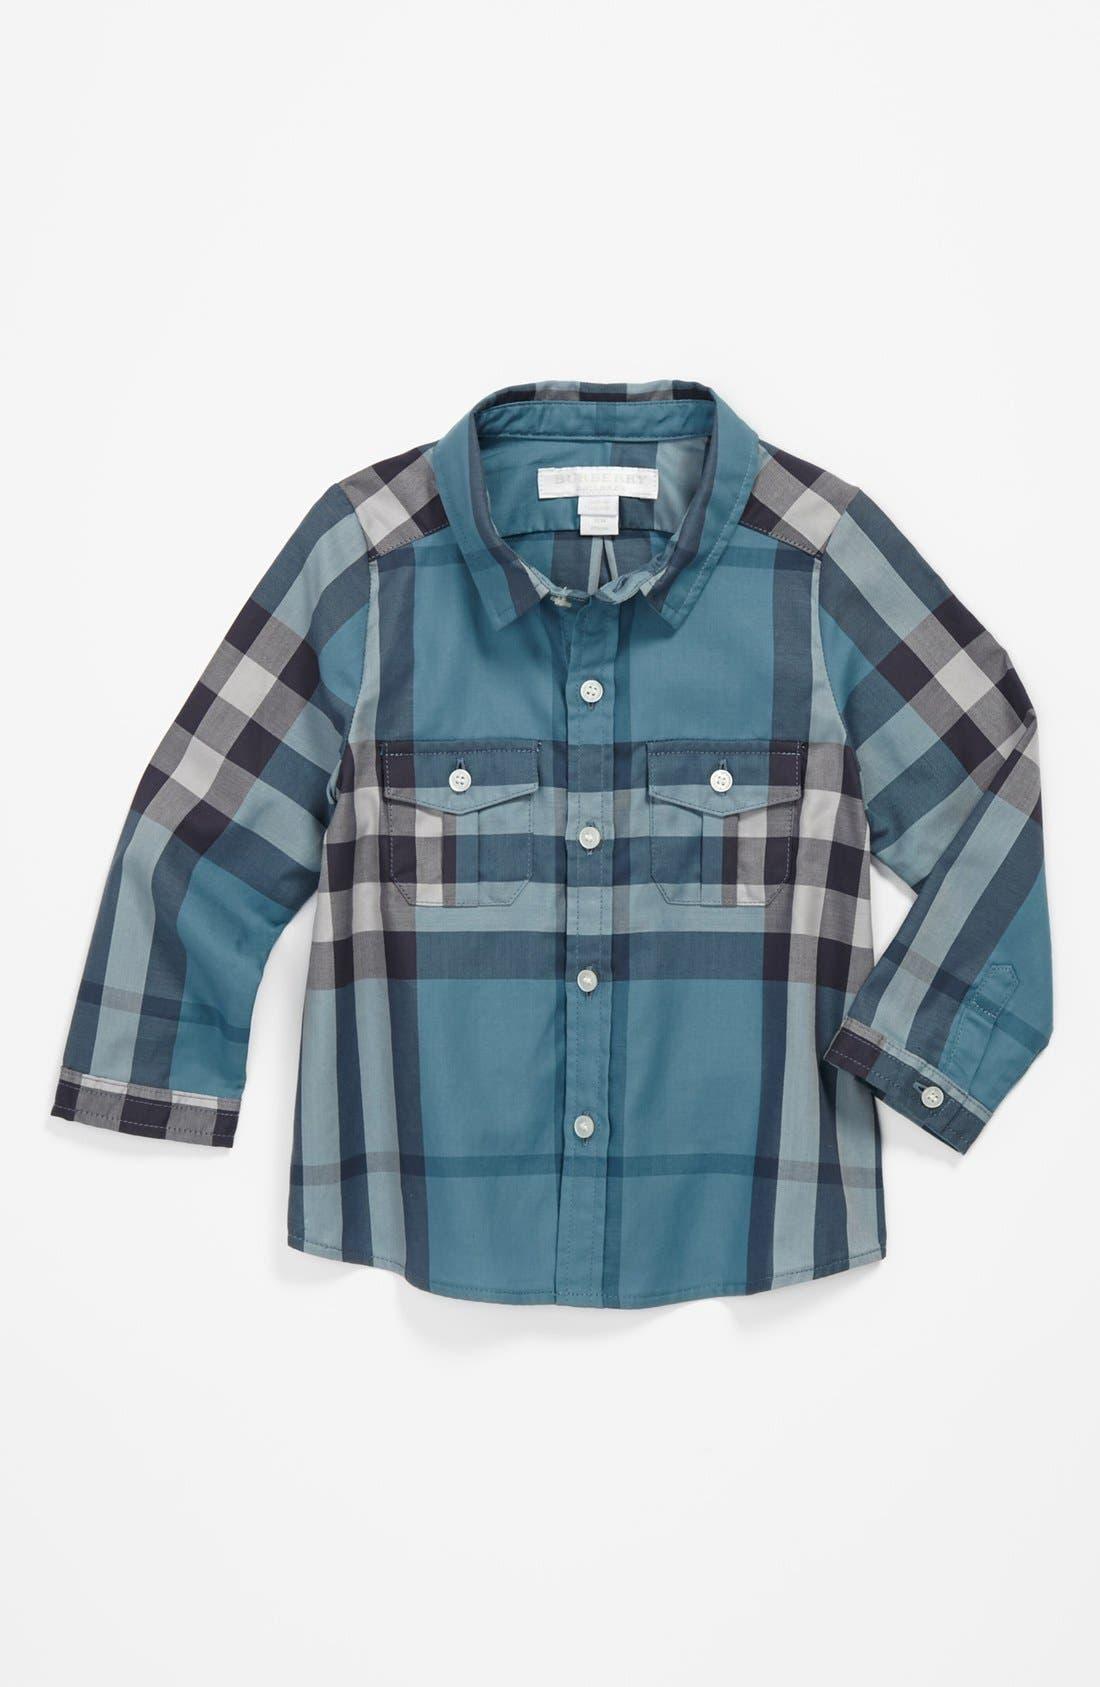 Alternate Image 1 Selected - Burberry 'Trent' Check Shirt (Toddler Boys)